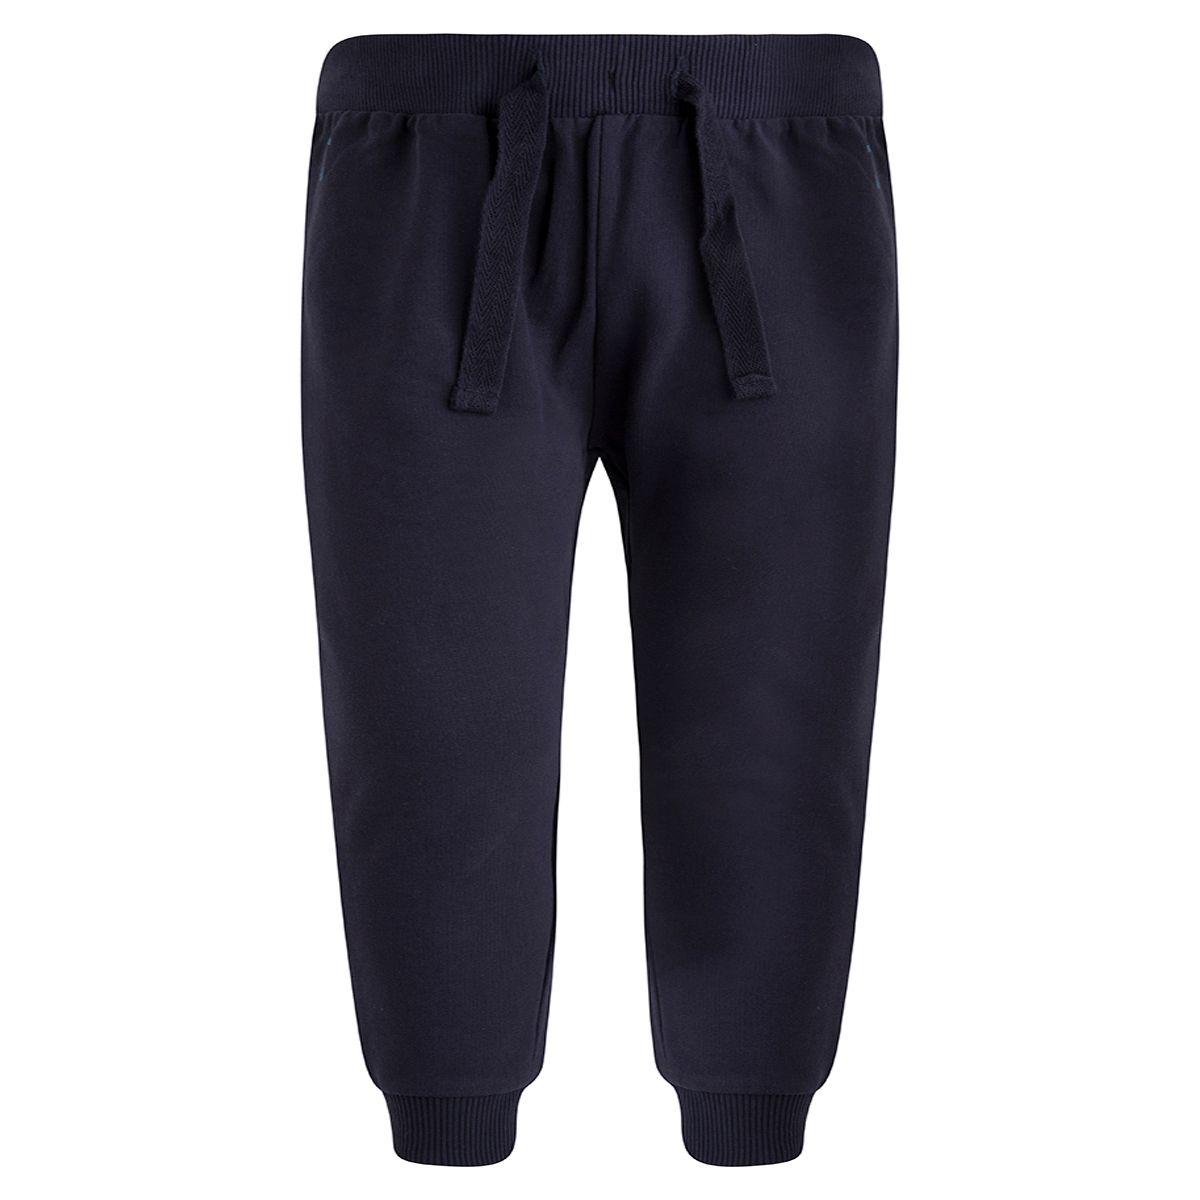 Pantalon bbbilly bébé garçon bleu